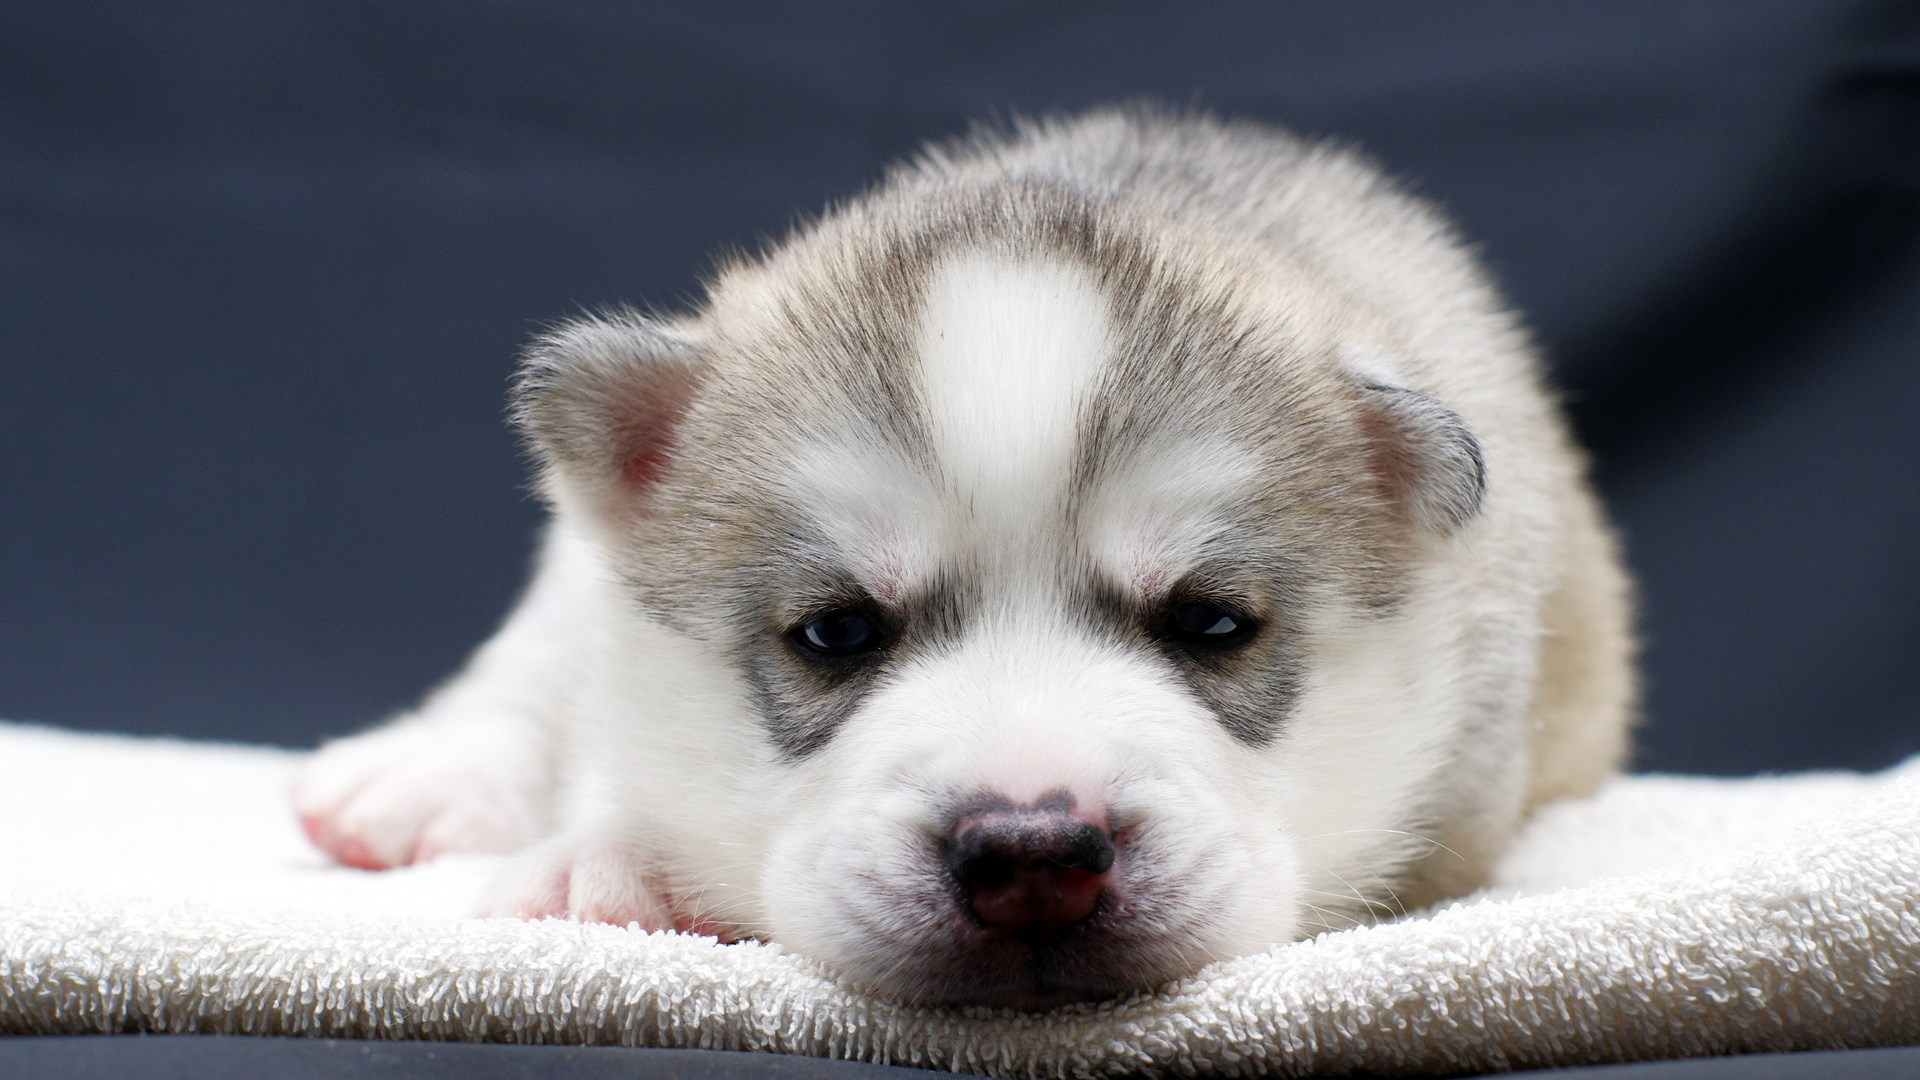 1920x1080-free-puppy-wallpaper-wpc5801055